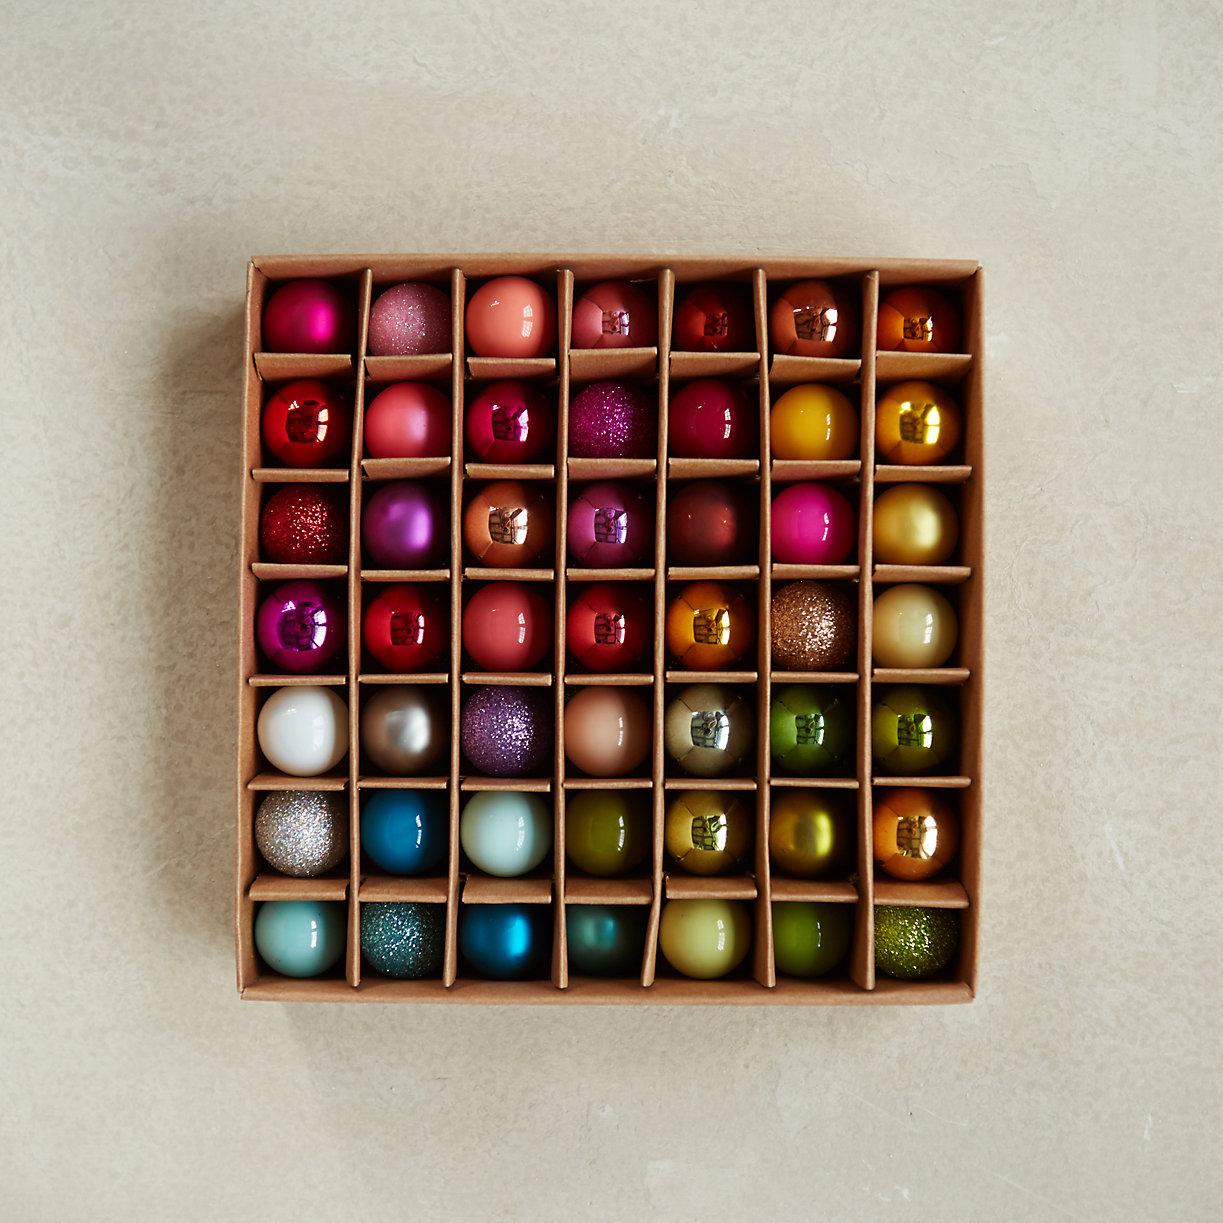 Terrain Miniature Bulb Set, 49 - Deck Your Halls Christmas Ornaments and Home Decor